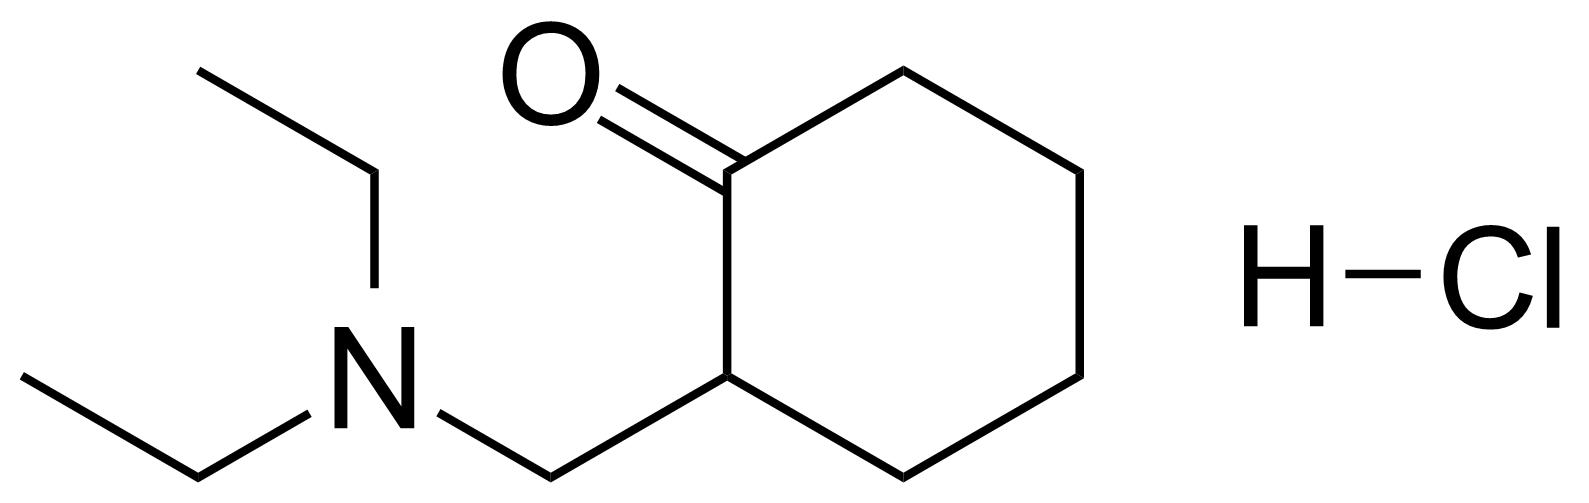 Structure of 2-[(Diethylamino)methyl]cyclohexanone hydrochloride